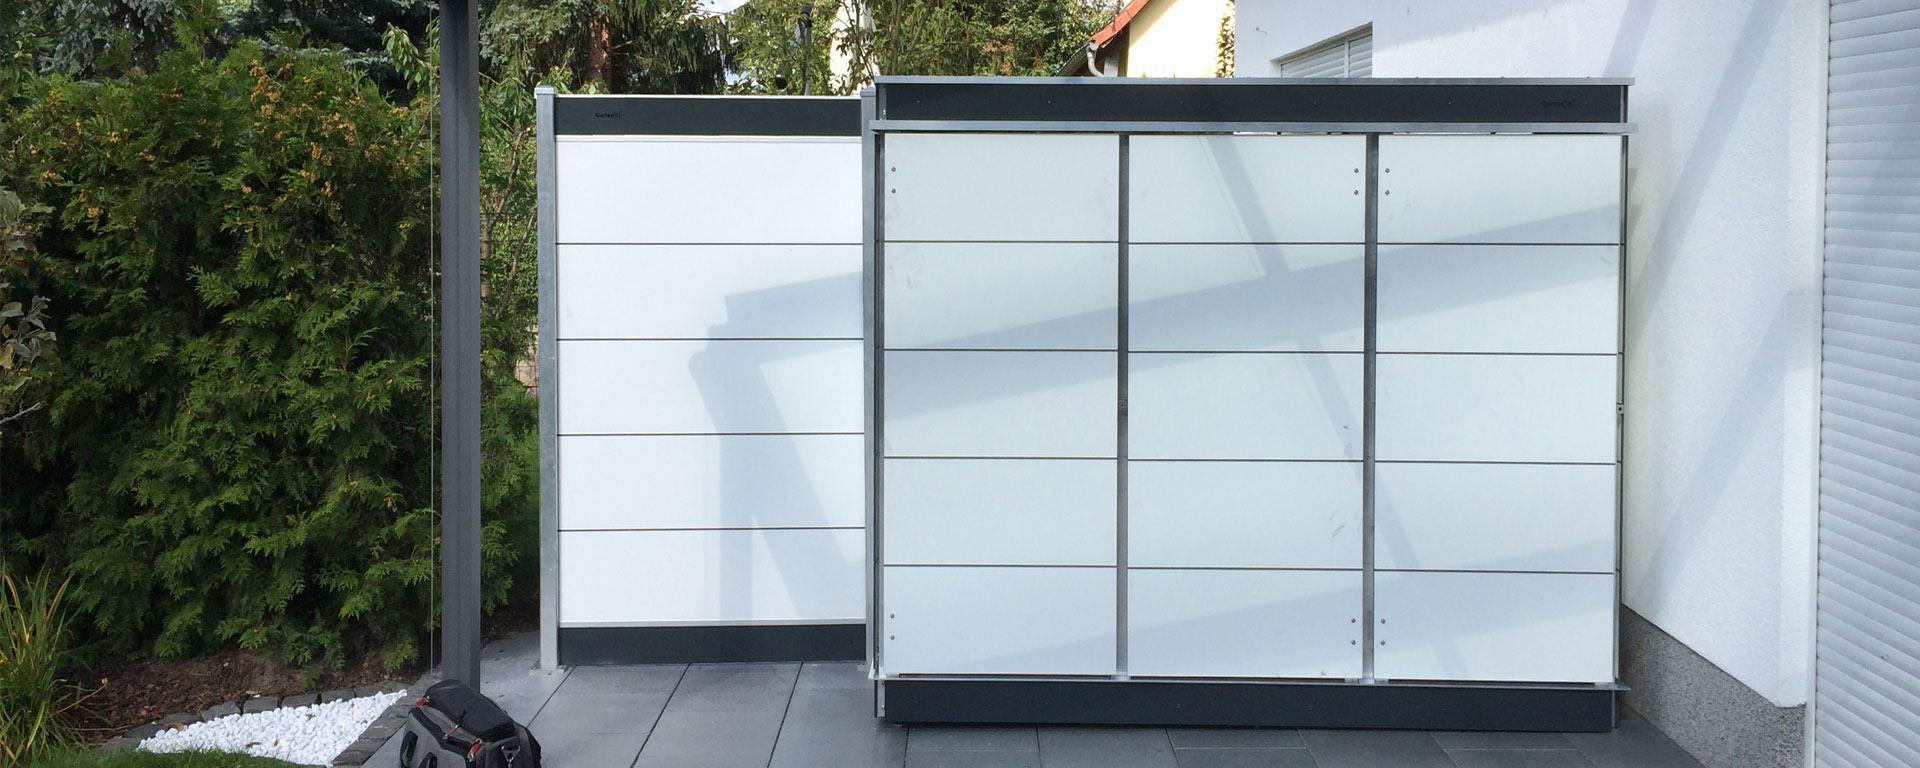 Sichtschutz Reihenhaus Gt Kollektion Ideen Garten Design